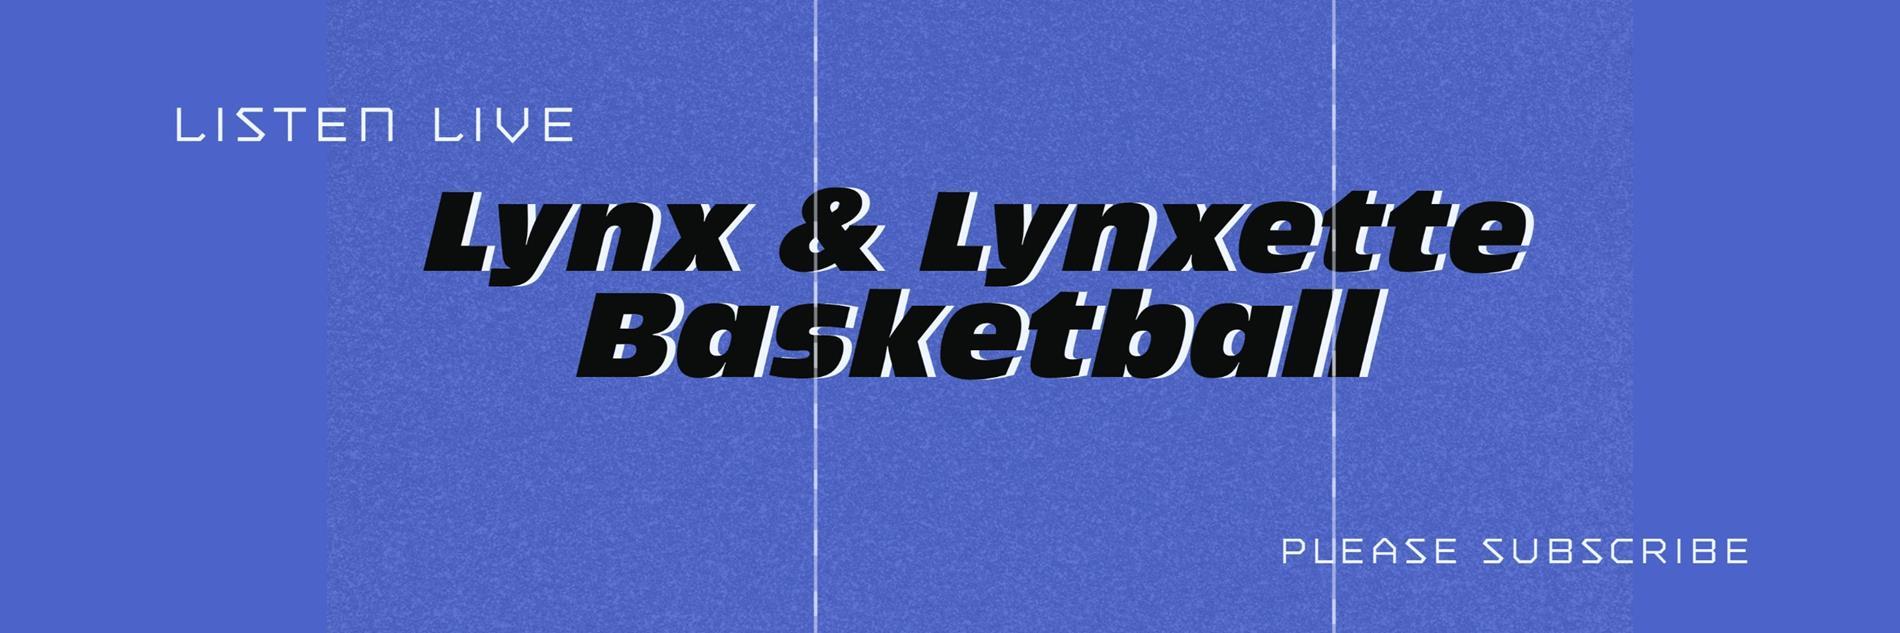 Basketball LYNX live pic